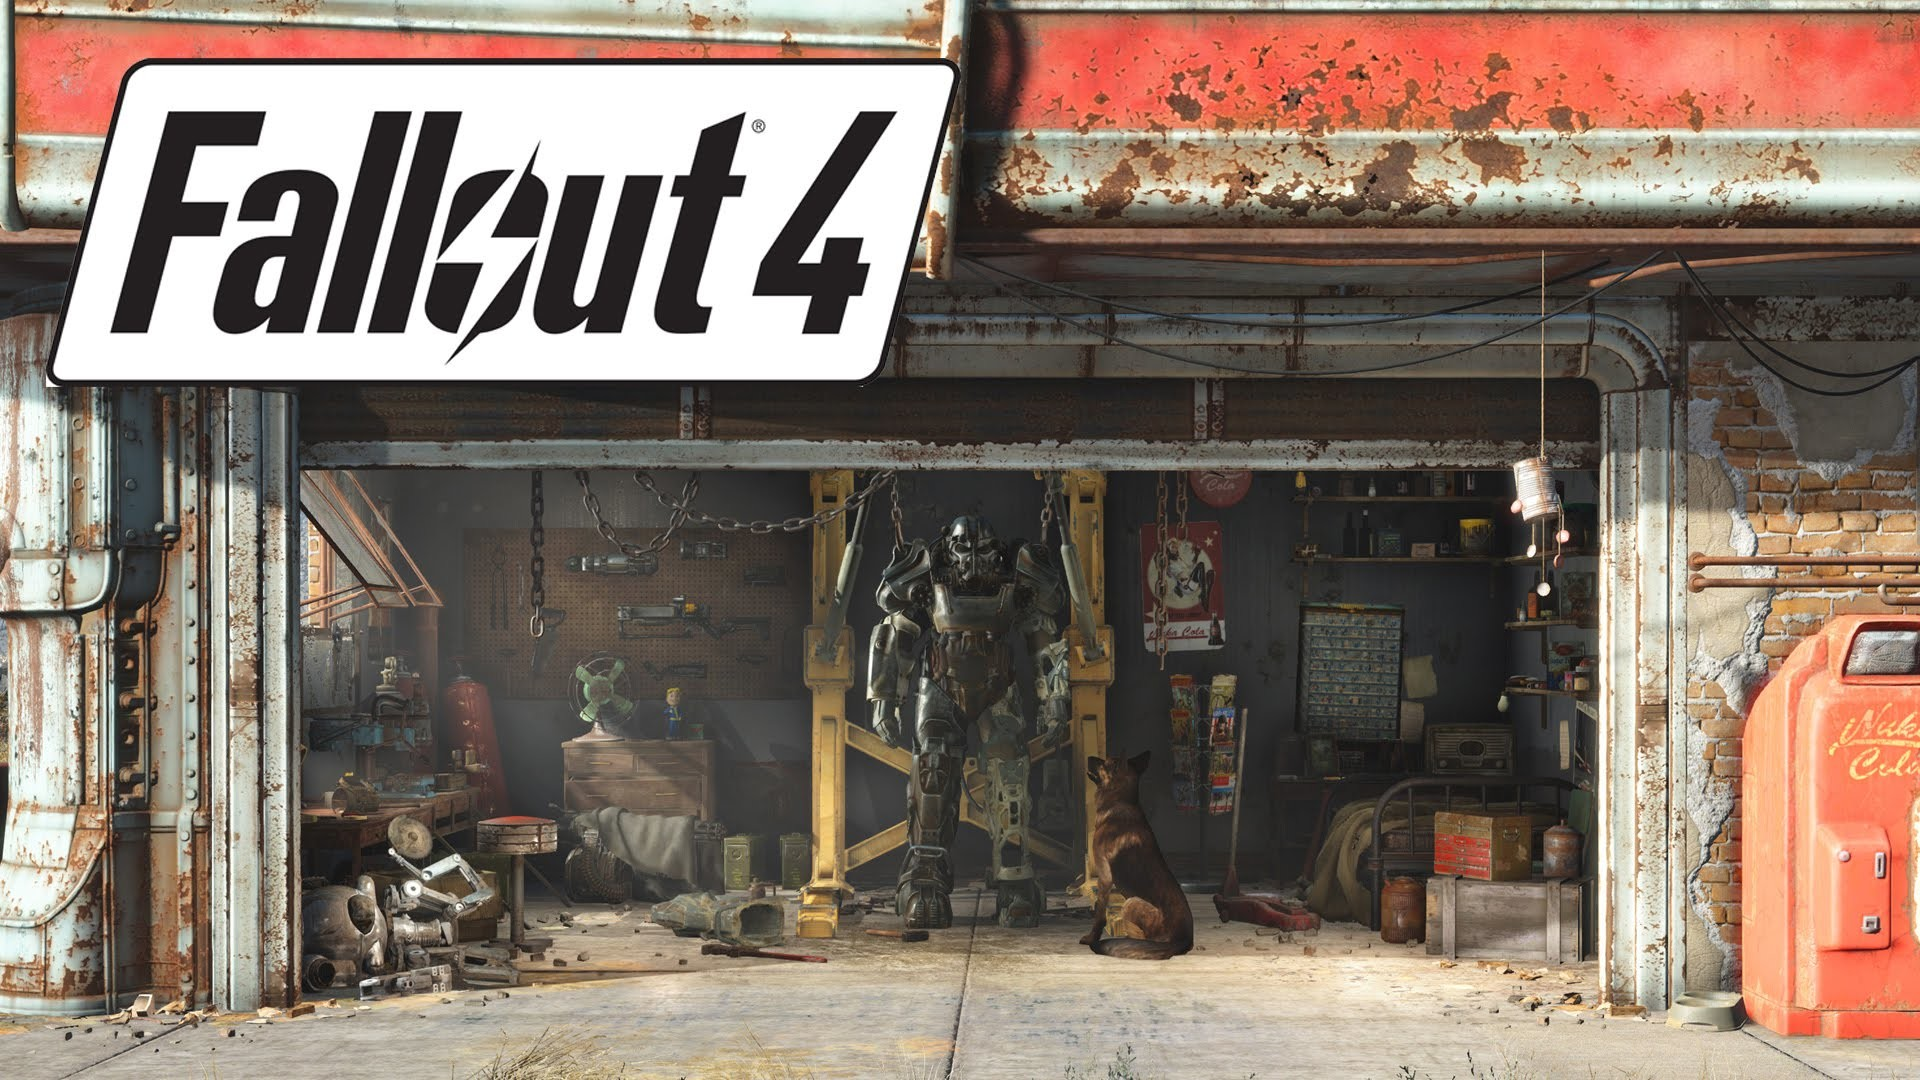 Fallout 4 – Home / Garage / Craft Area Anaylsis (Customization) – YouTube